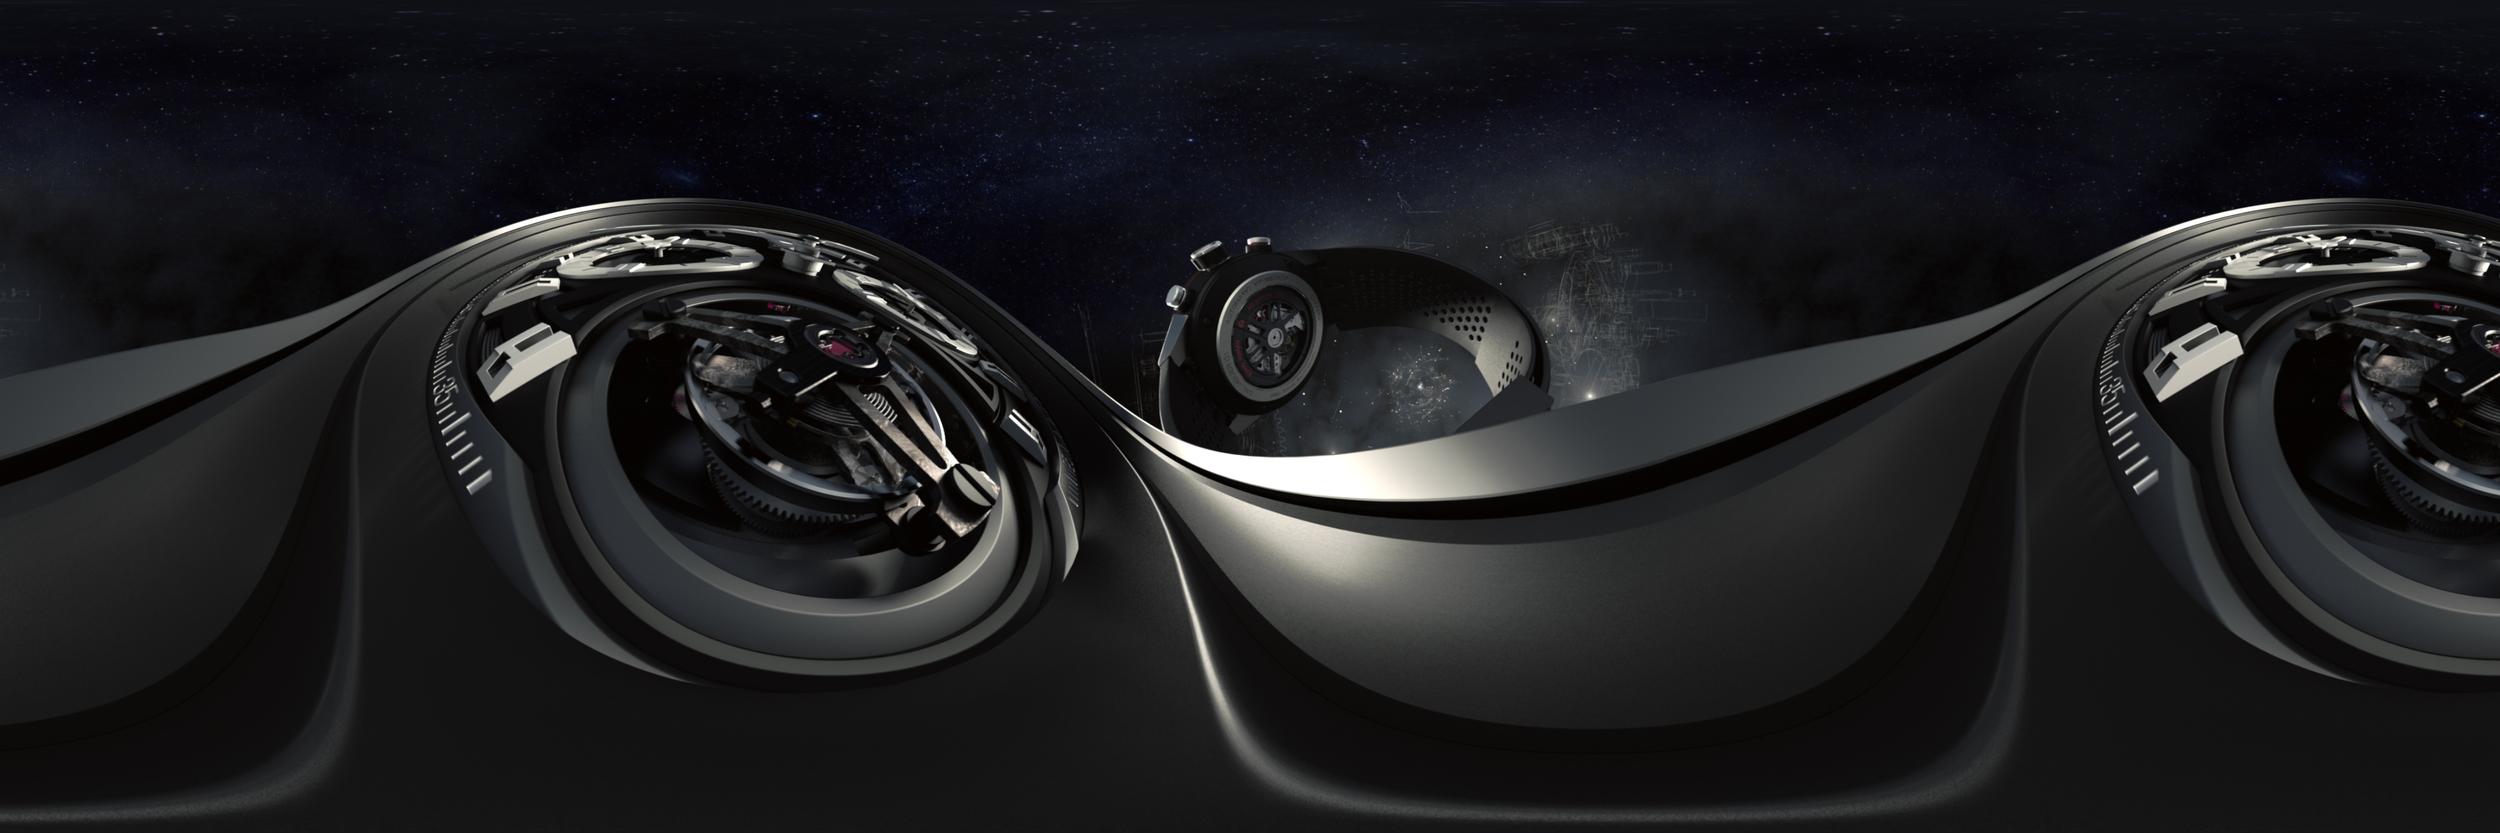 TH_VR-Panorama (06705).jpg